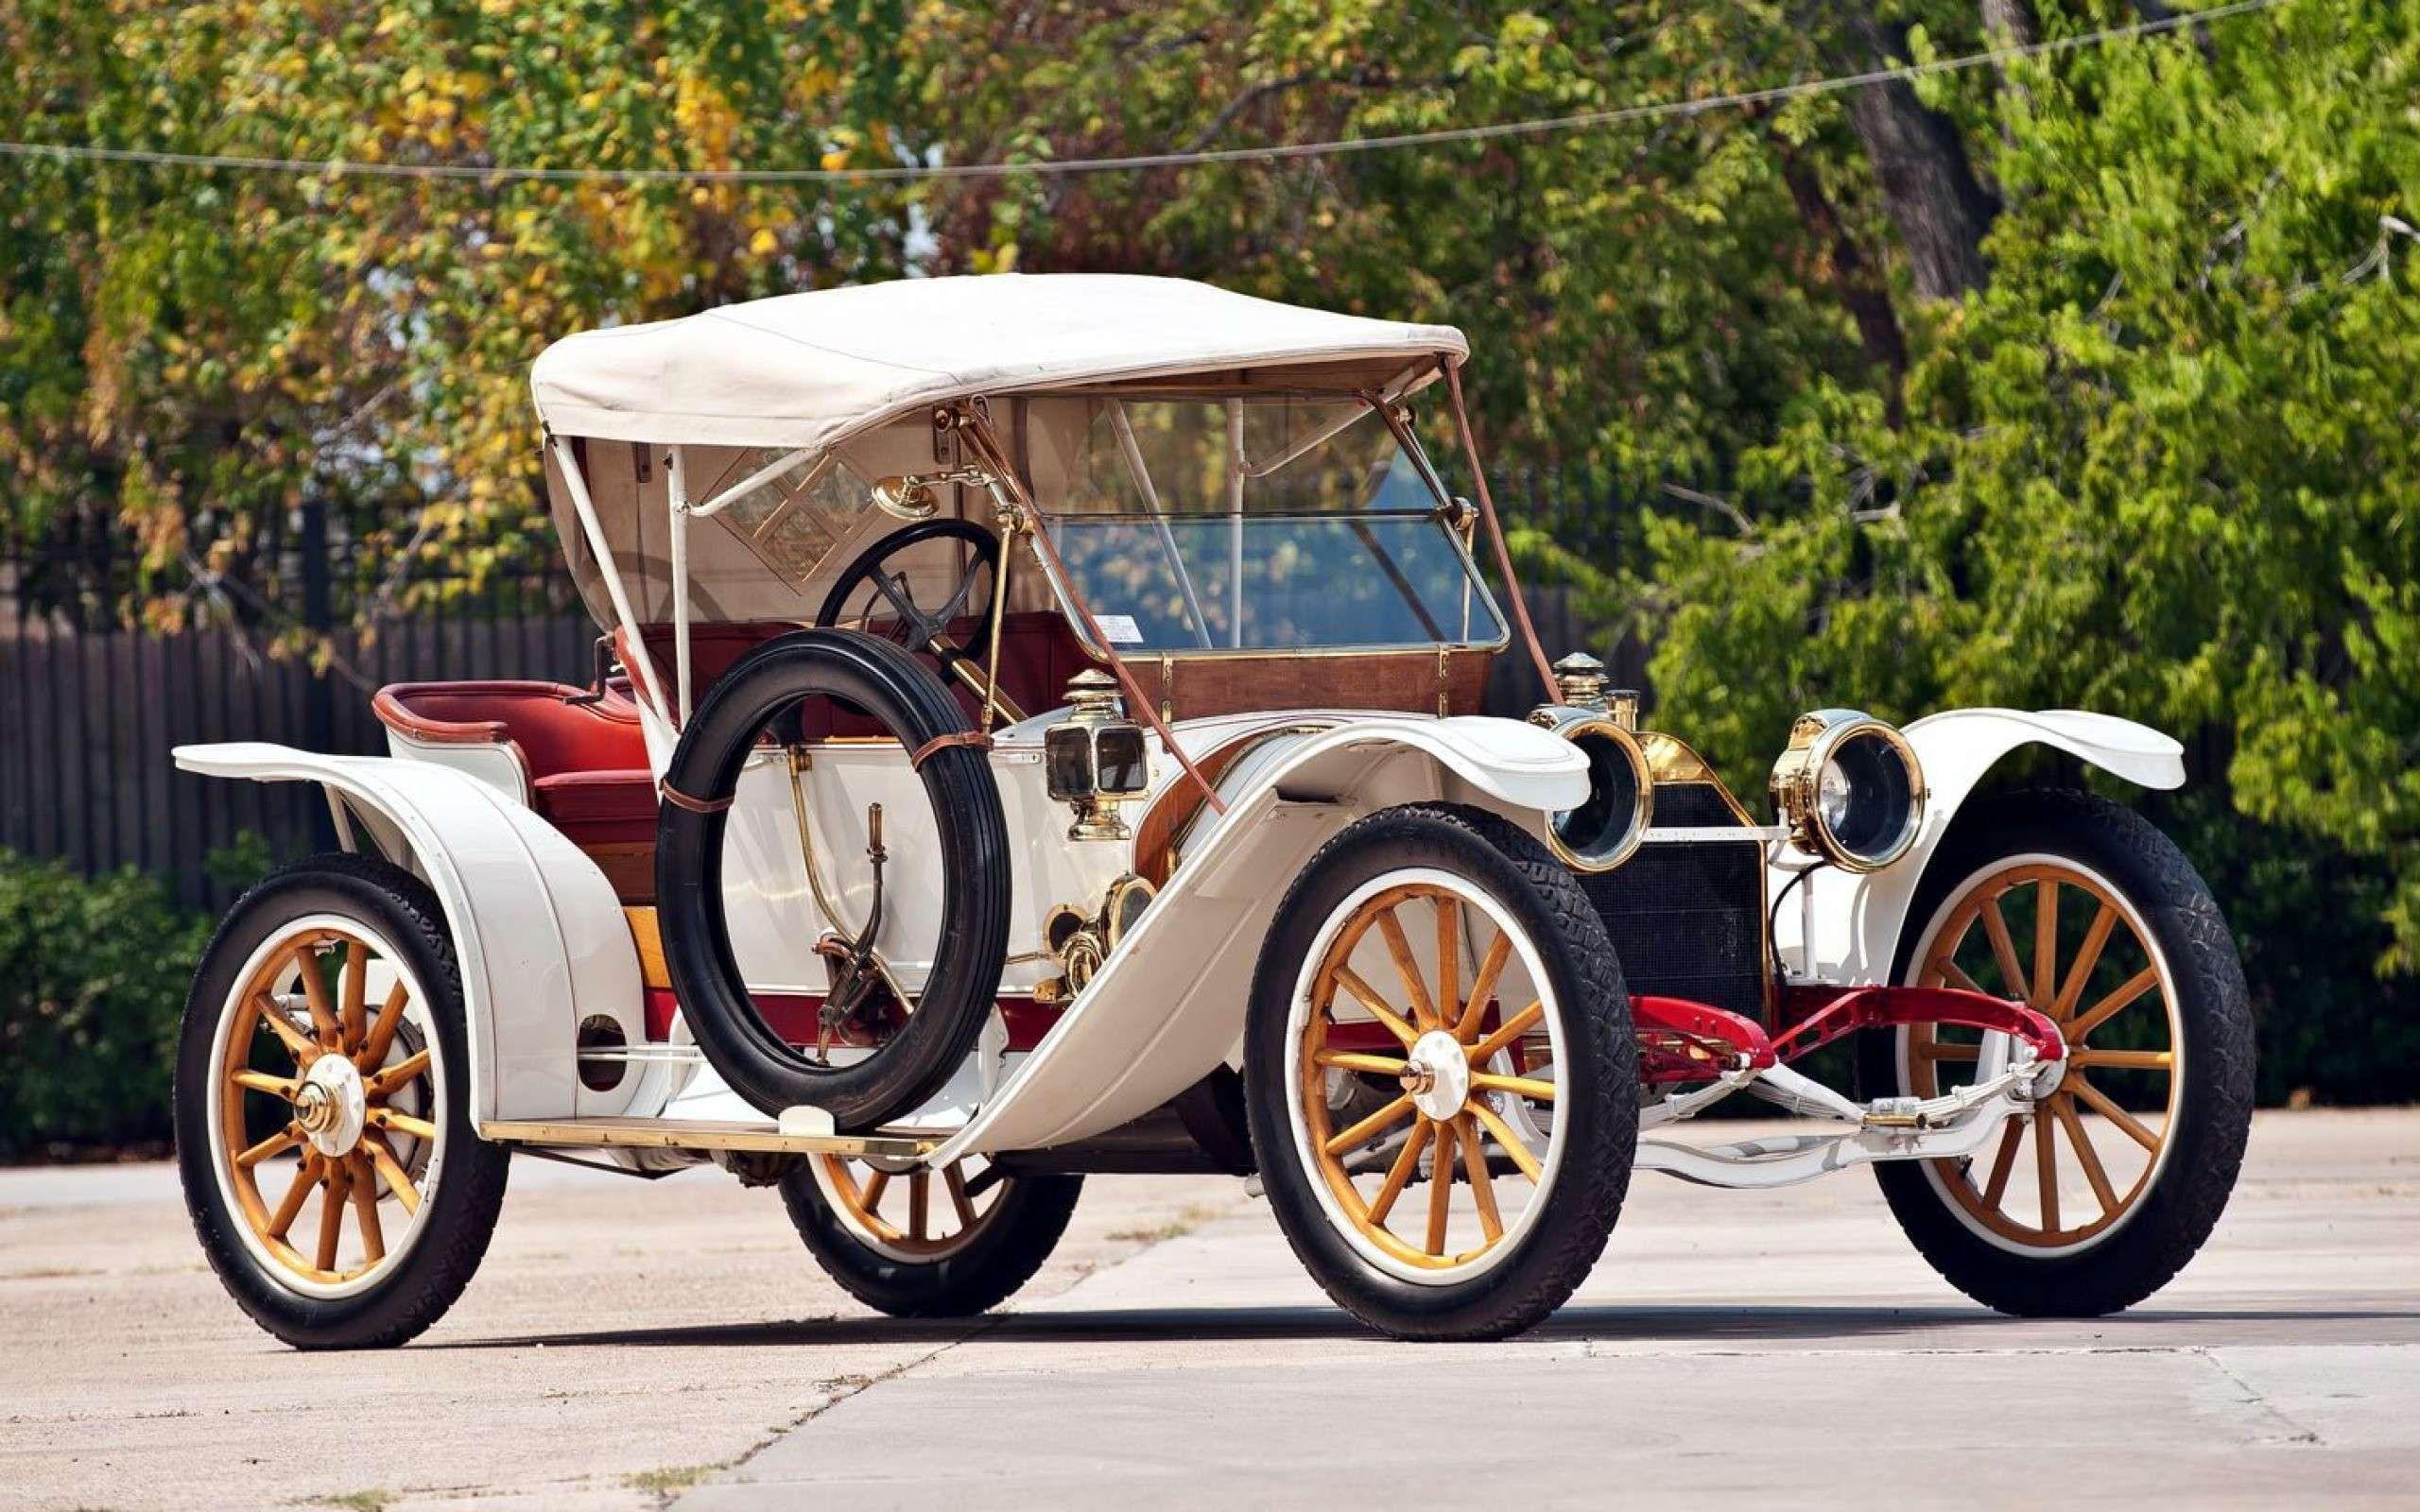 vintage-car-widescreen-wallpaper-hd-wallpapers-source-antique-cars ...